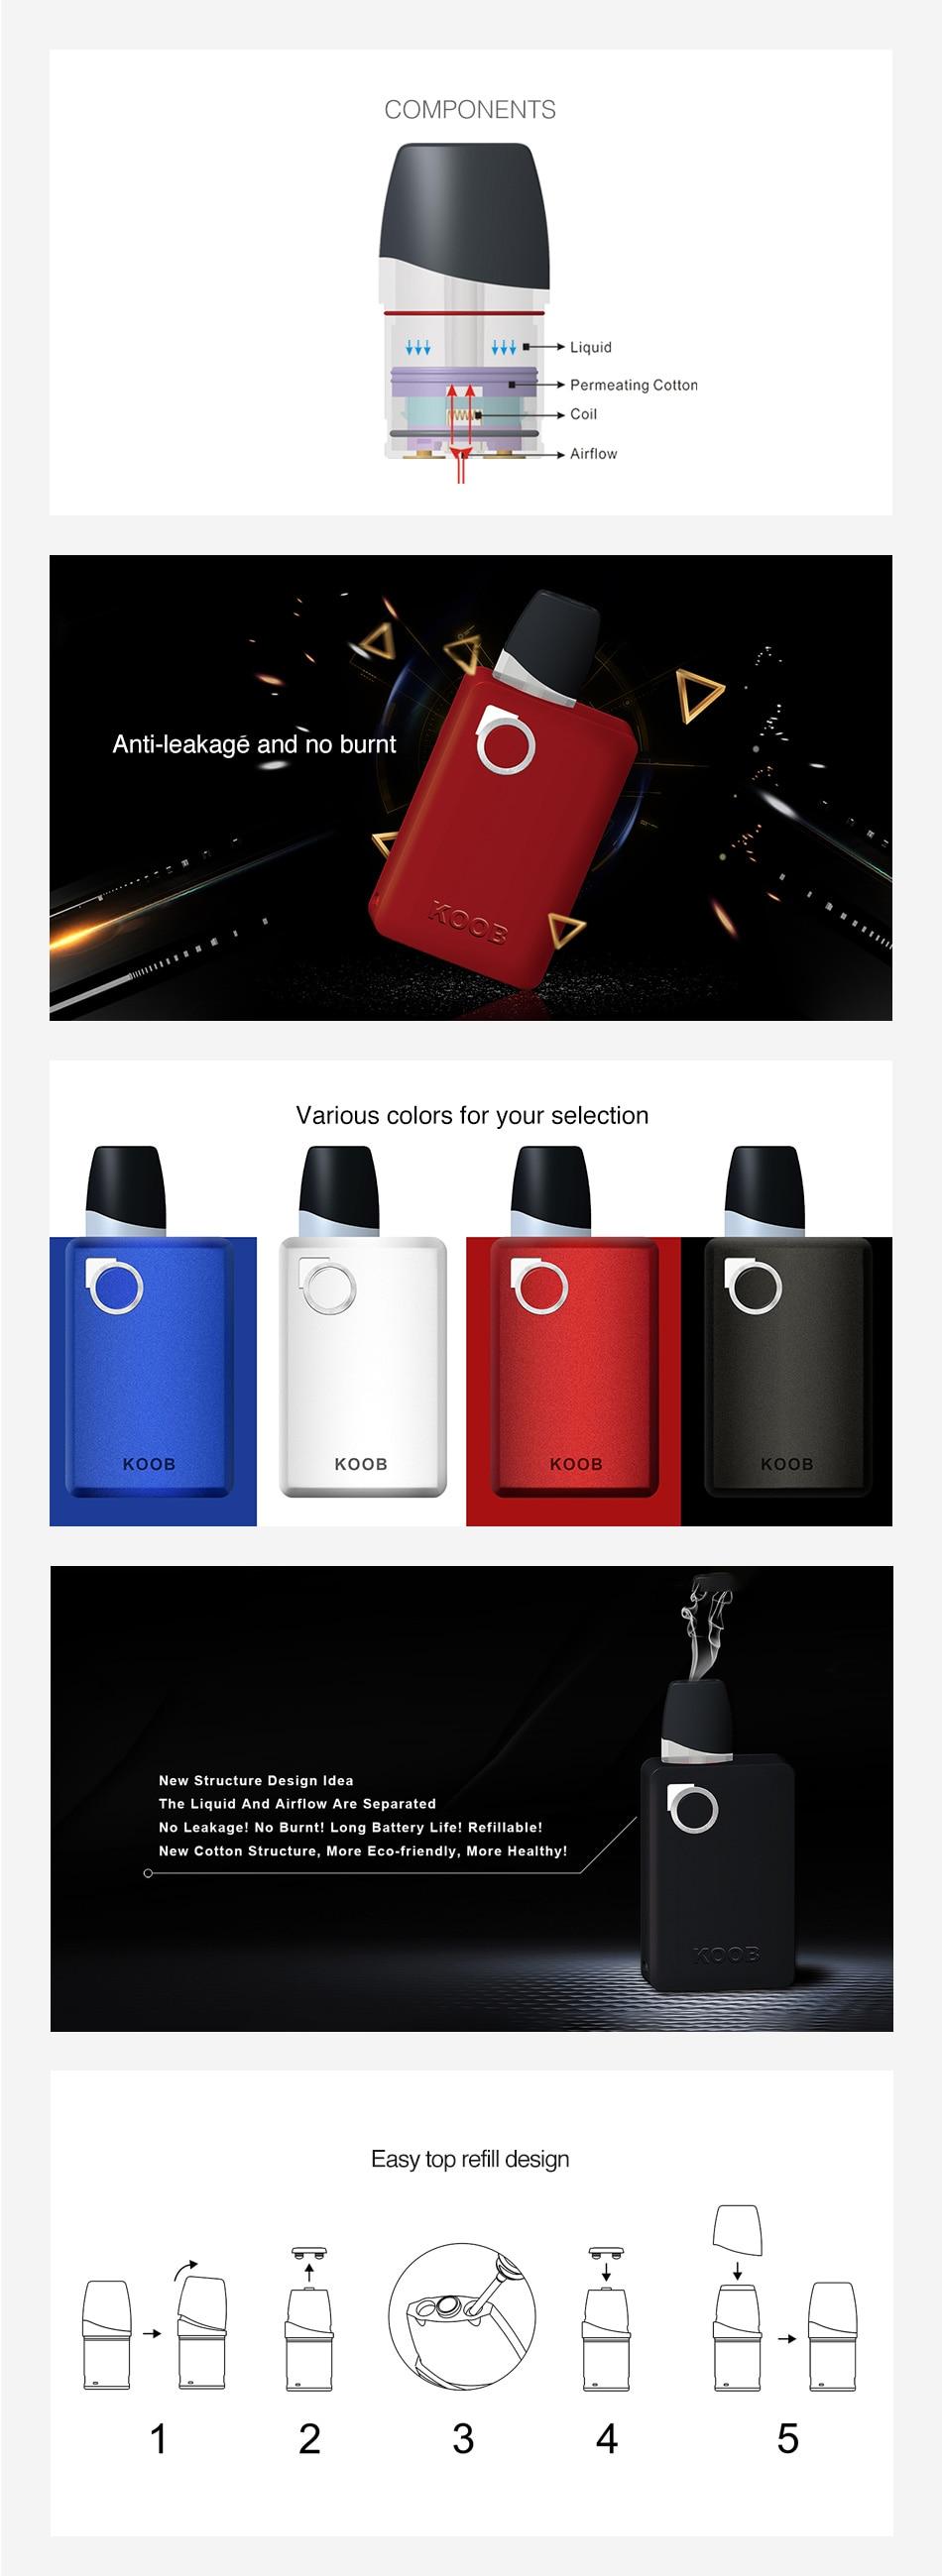 , Original OVANTY KOOB Pod Vape Kit with 1000mAh Built-in Battery & 1.5ml Pod Vape Kit Pod System vs Minifit/ Pal 2